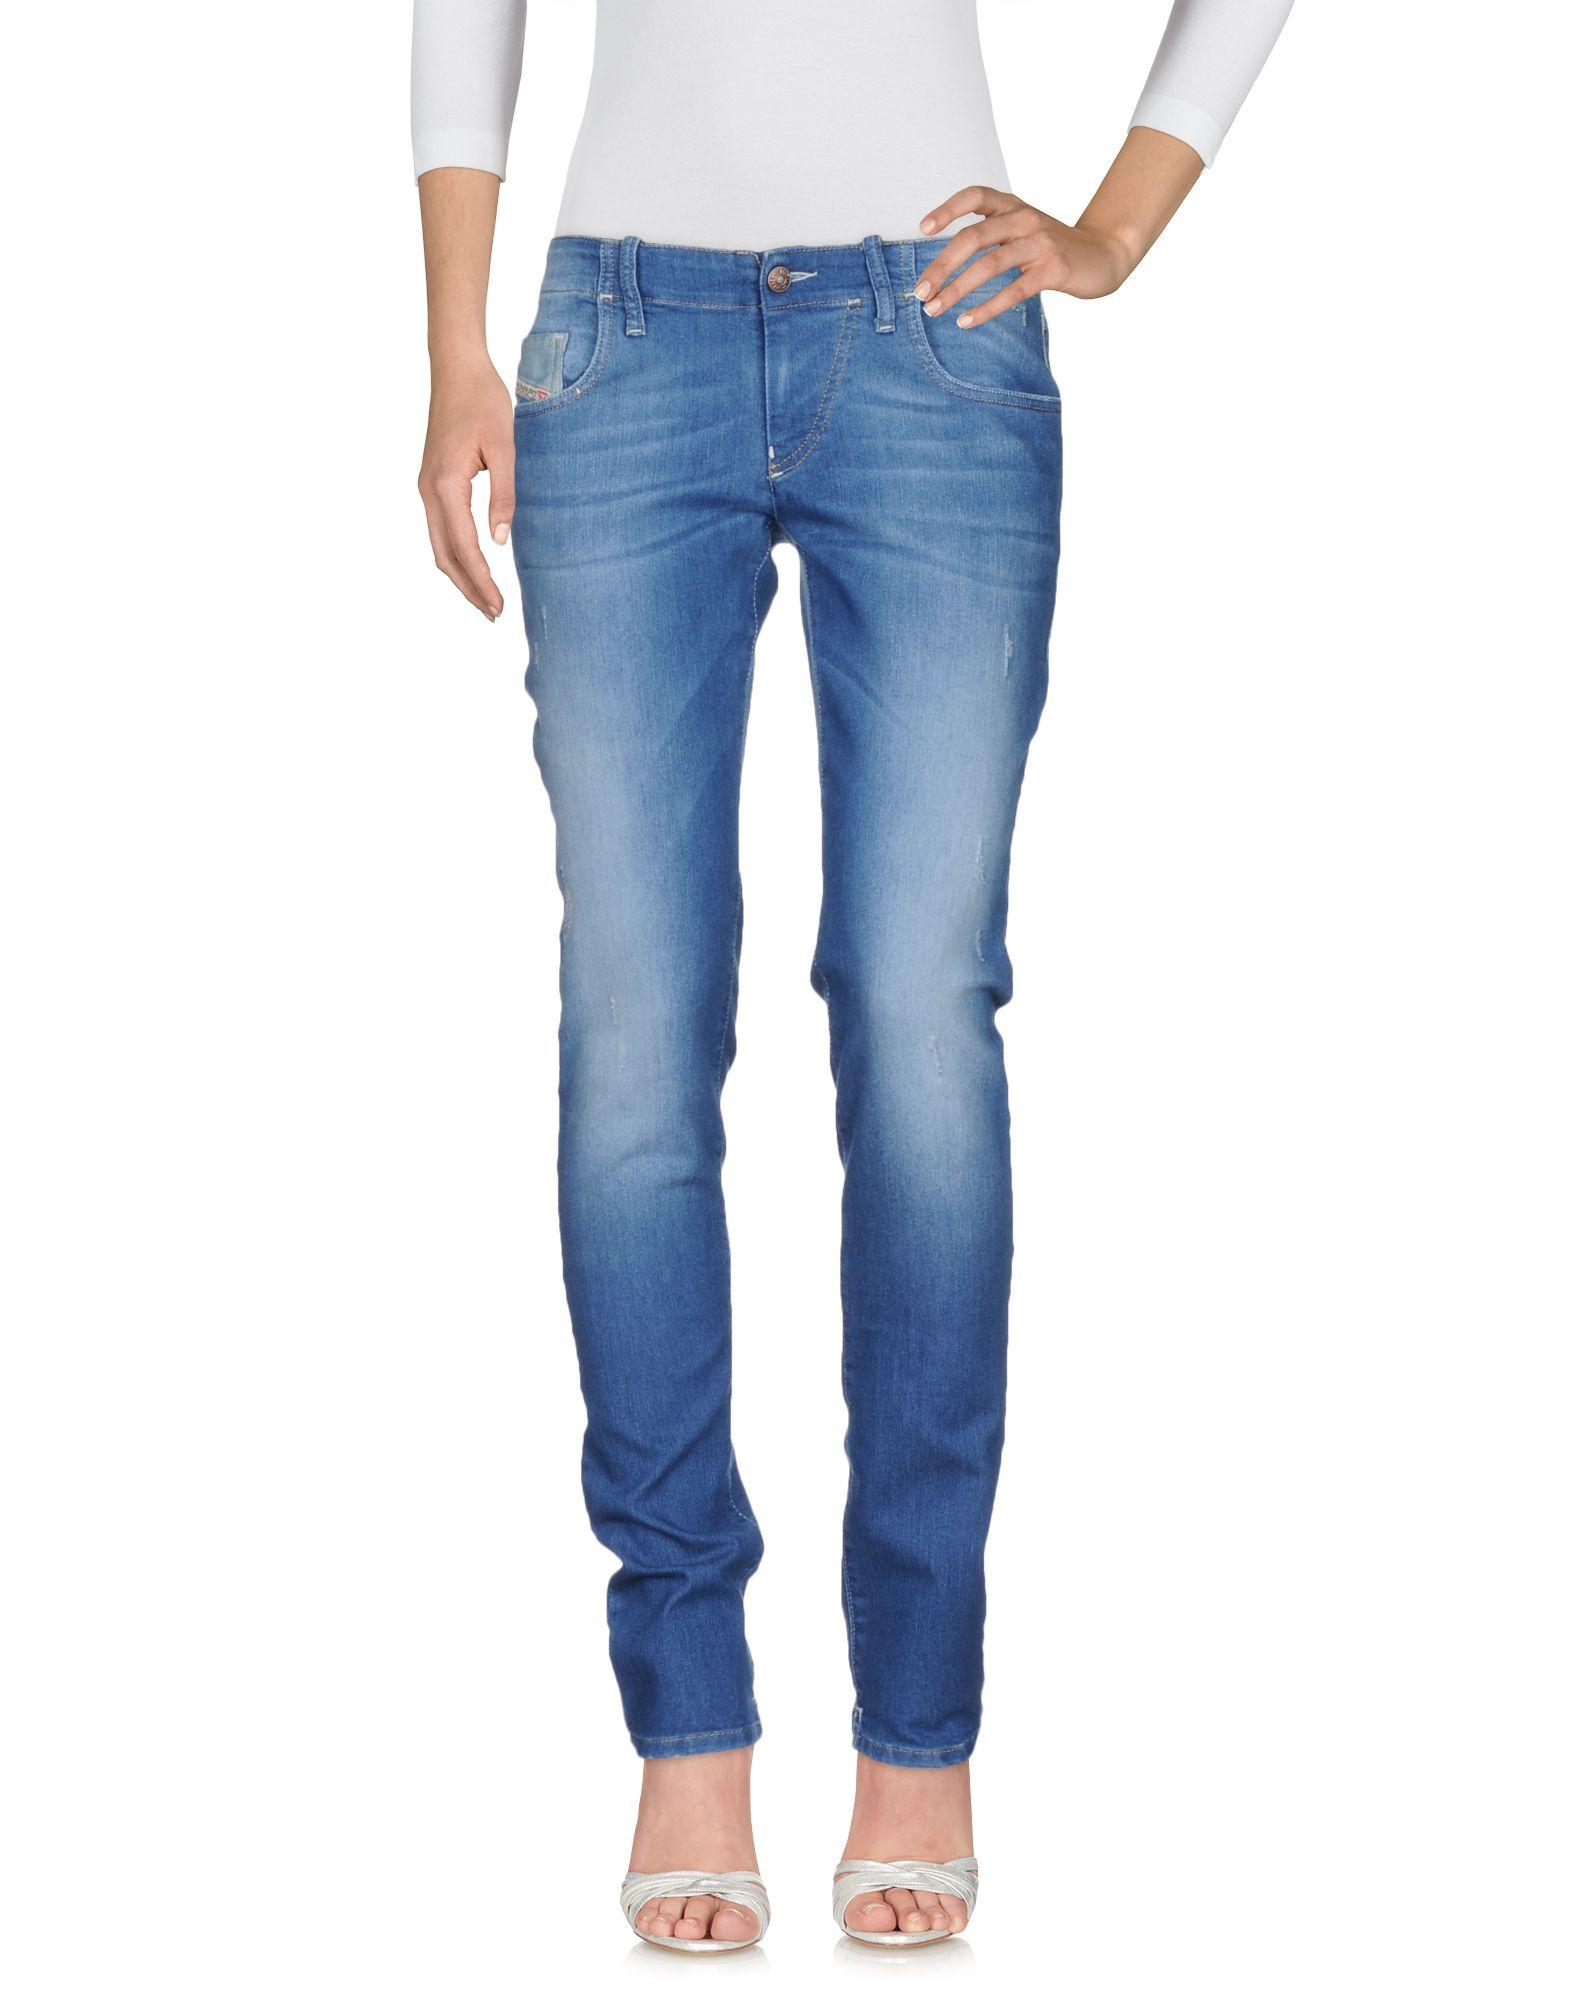 Pantaloni Jeans Diesel Donna - Acquista online su IEPQb9cIx